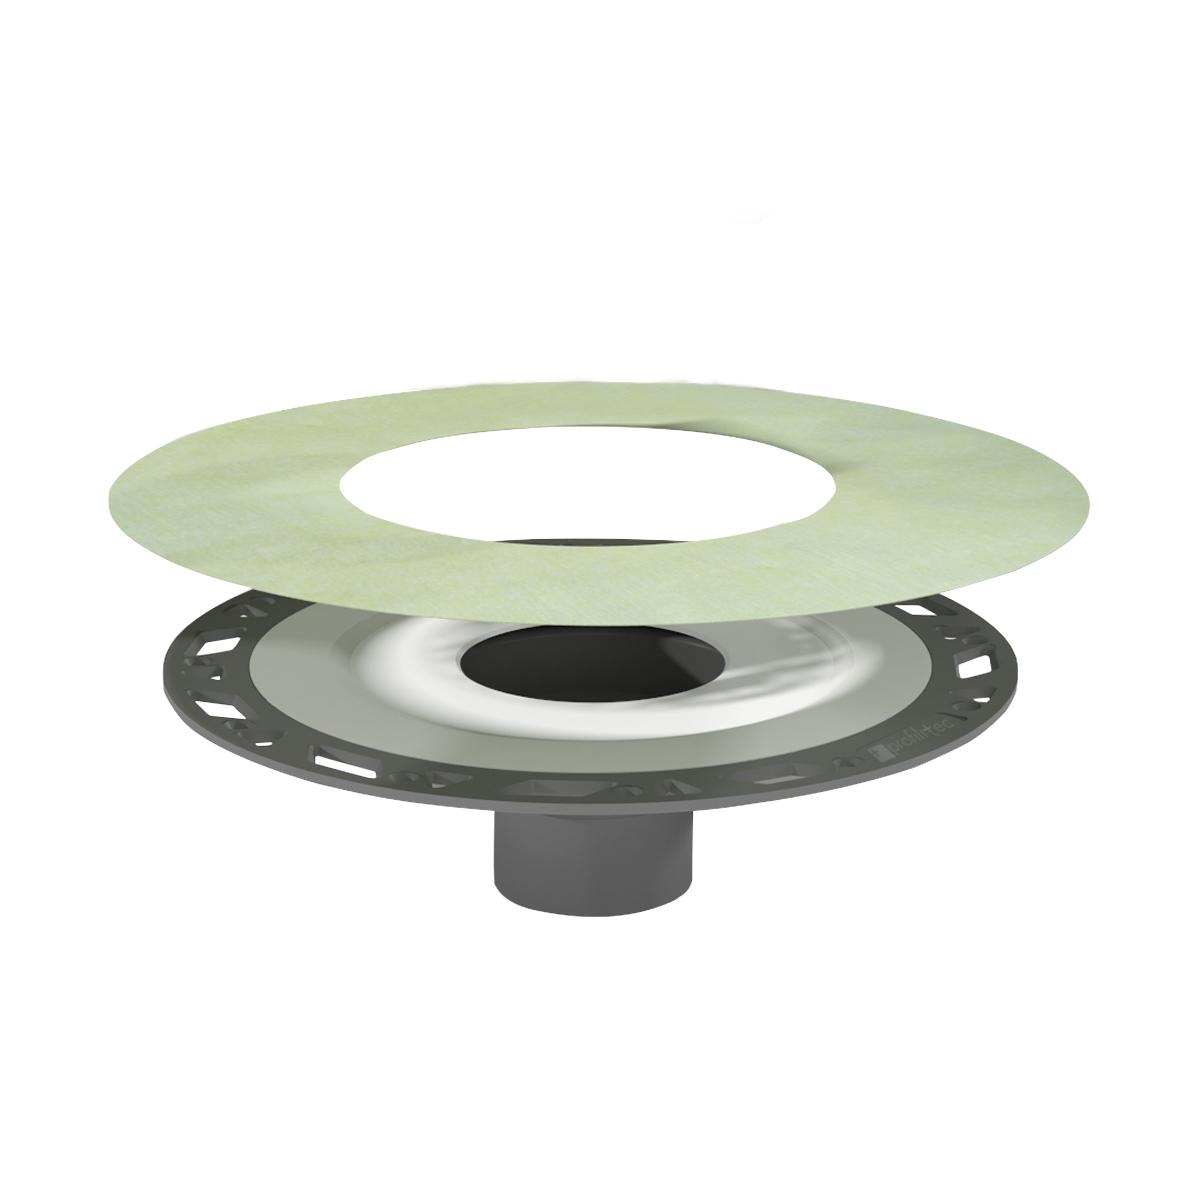 Sistemi di Drenaggio Showertec STC Kit Flangia Profilitec